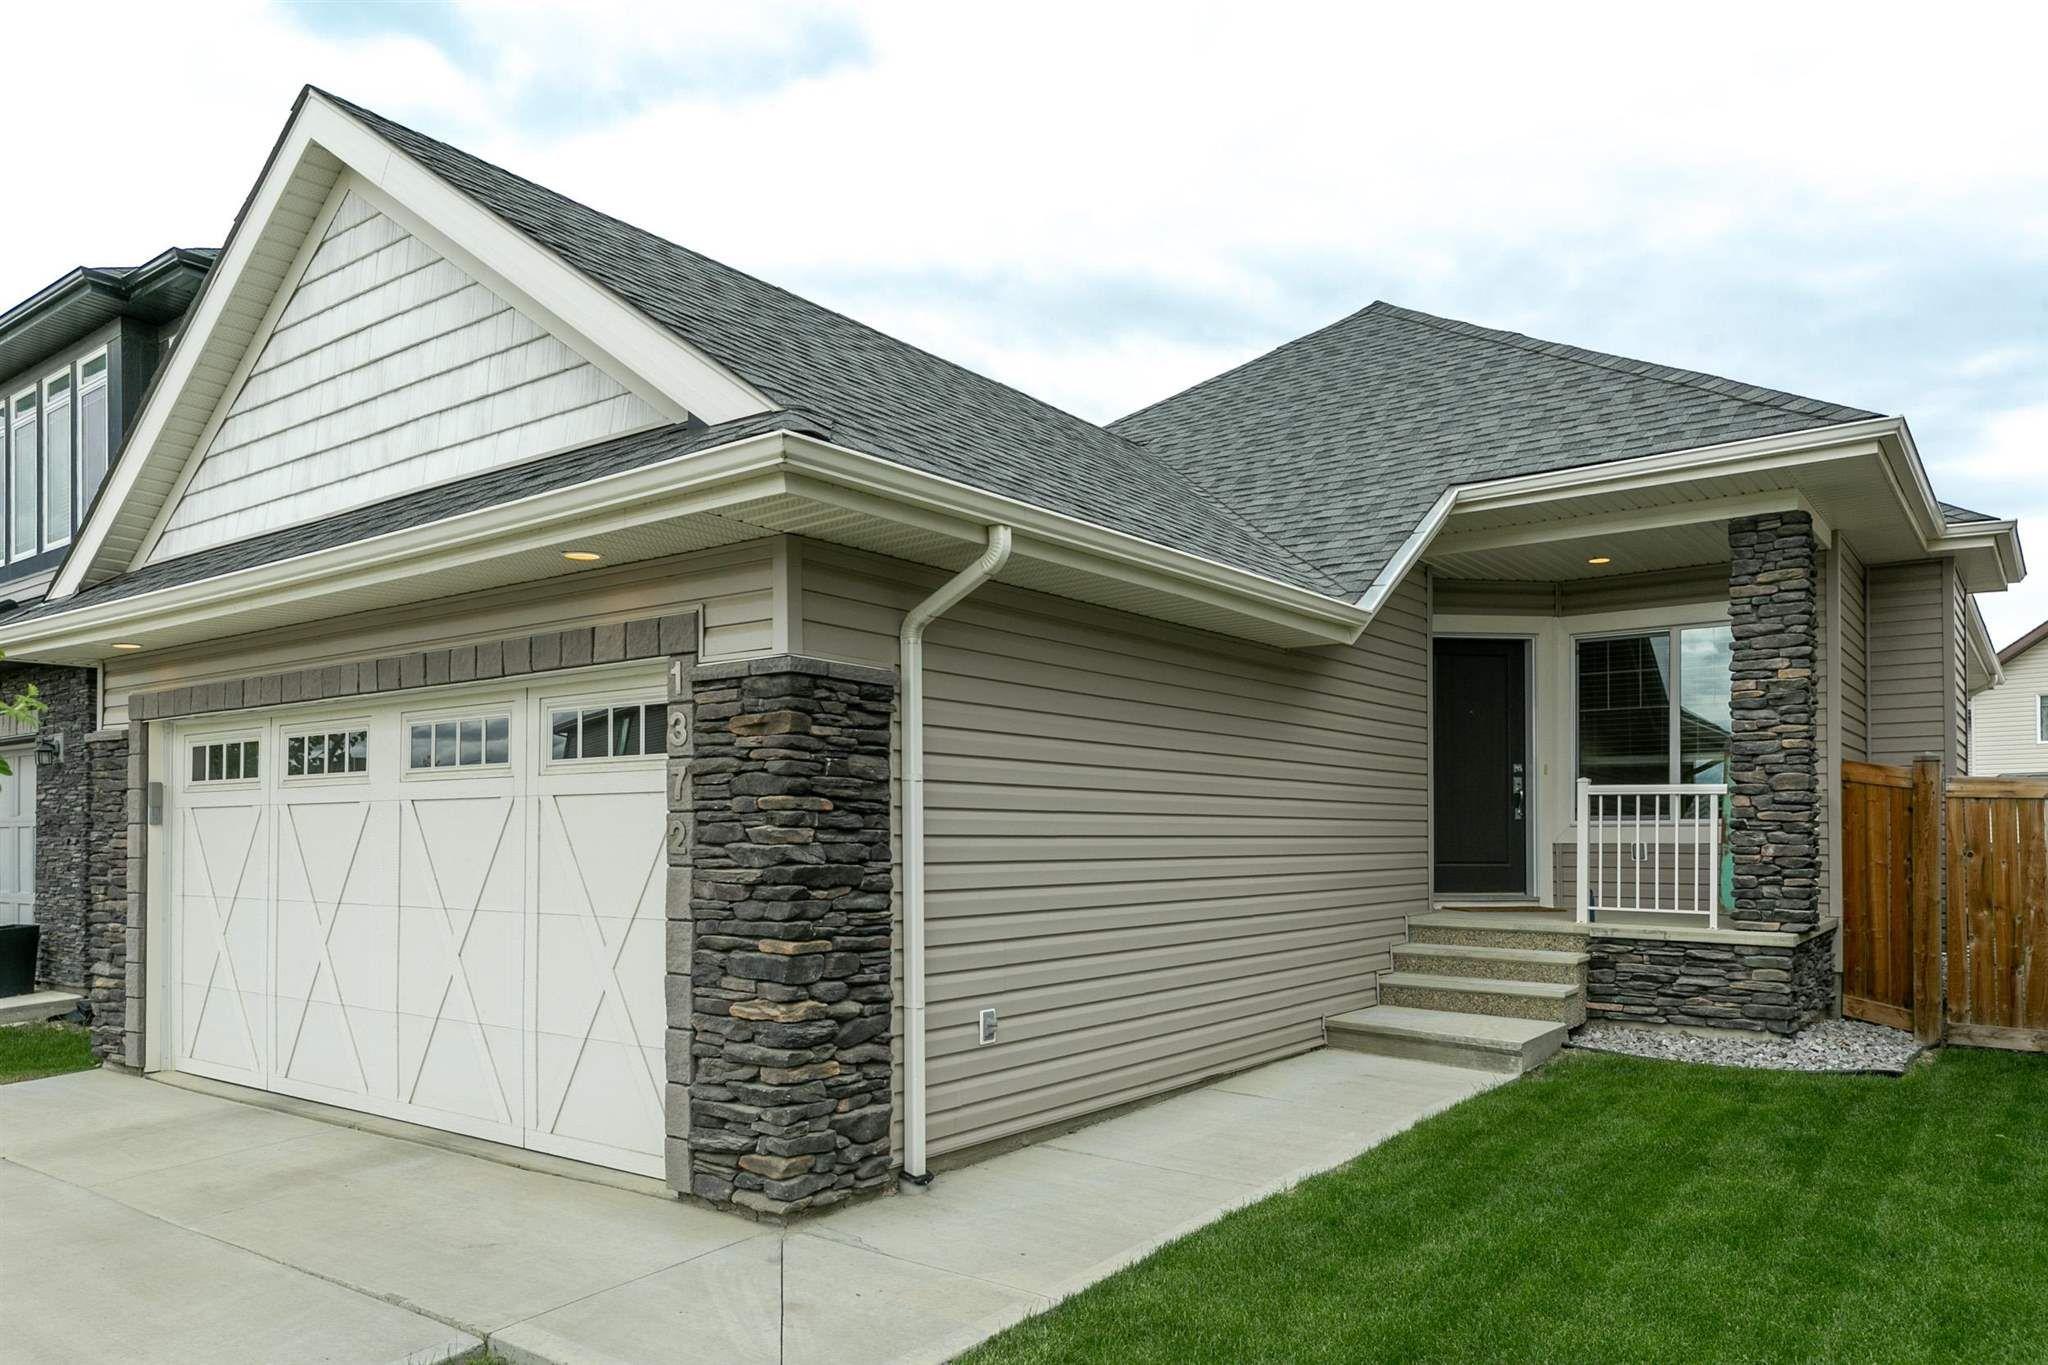 Main Photo: 1372 158 Street in Edmonton: Zone 56 House for sale : MLS®# E4248008